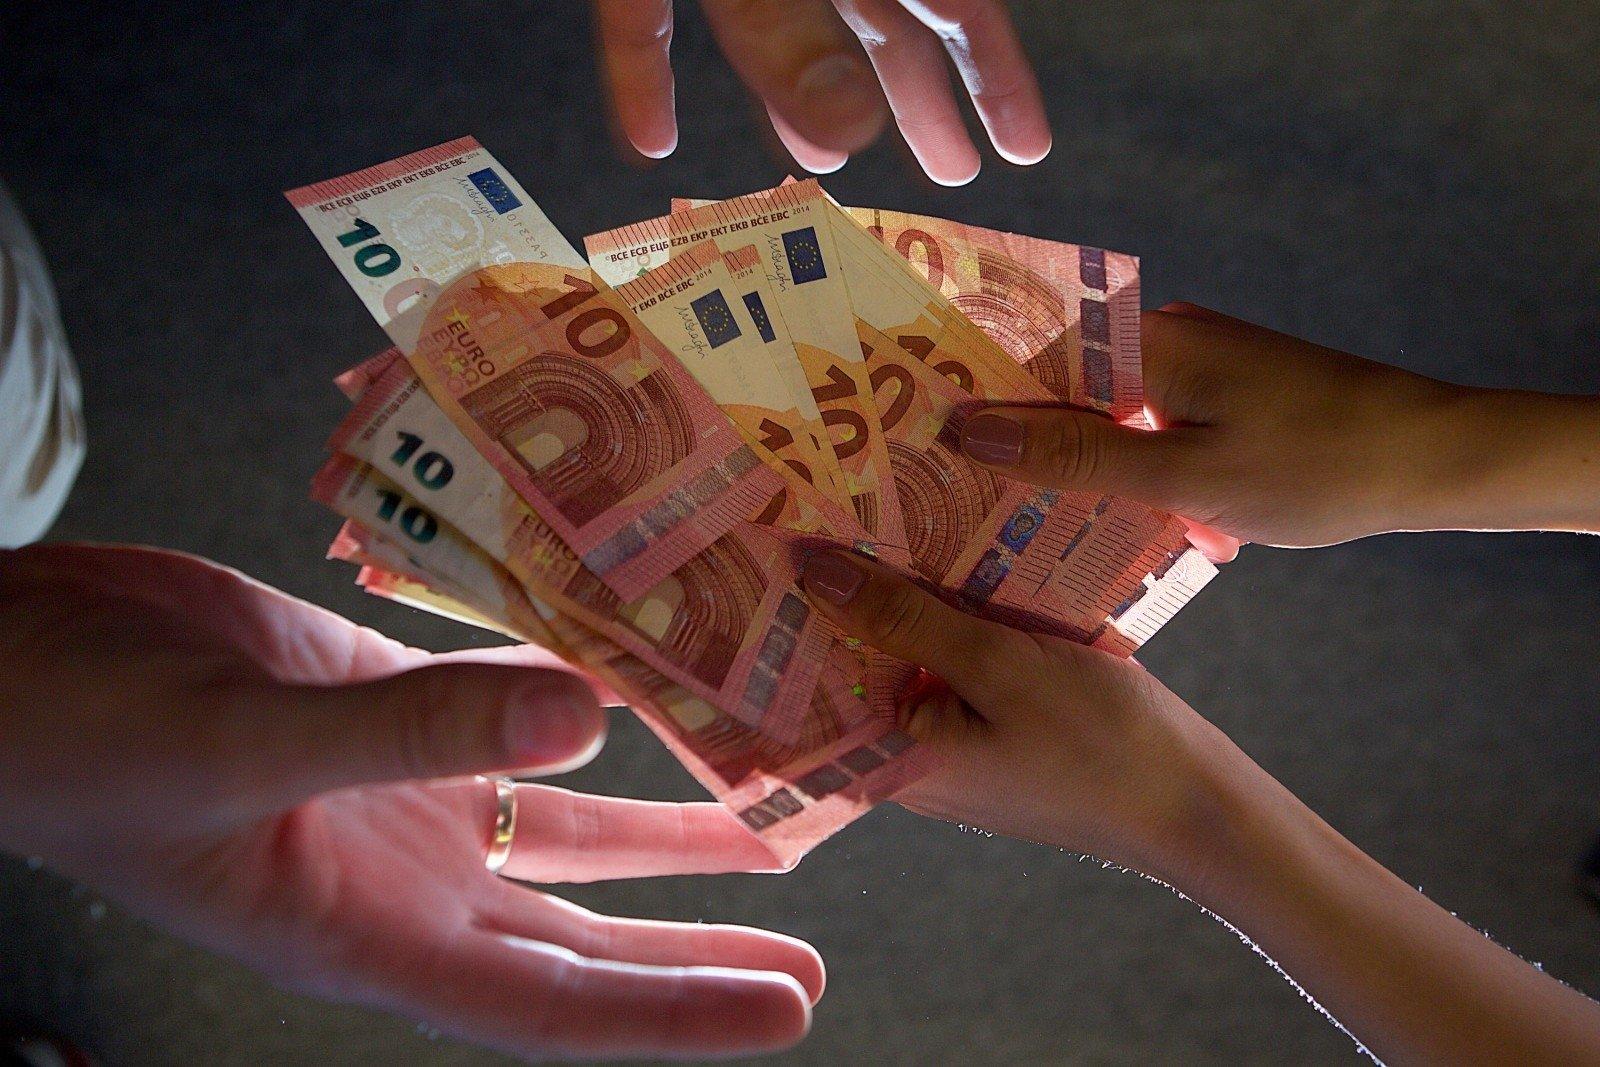 ar galima užsidirbti pinigų ditraduojant